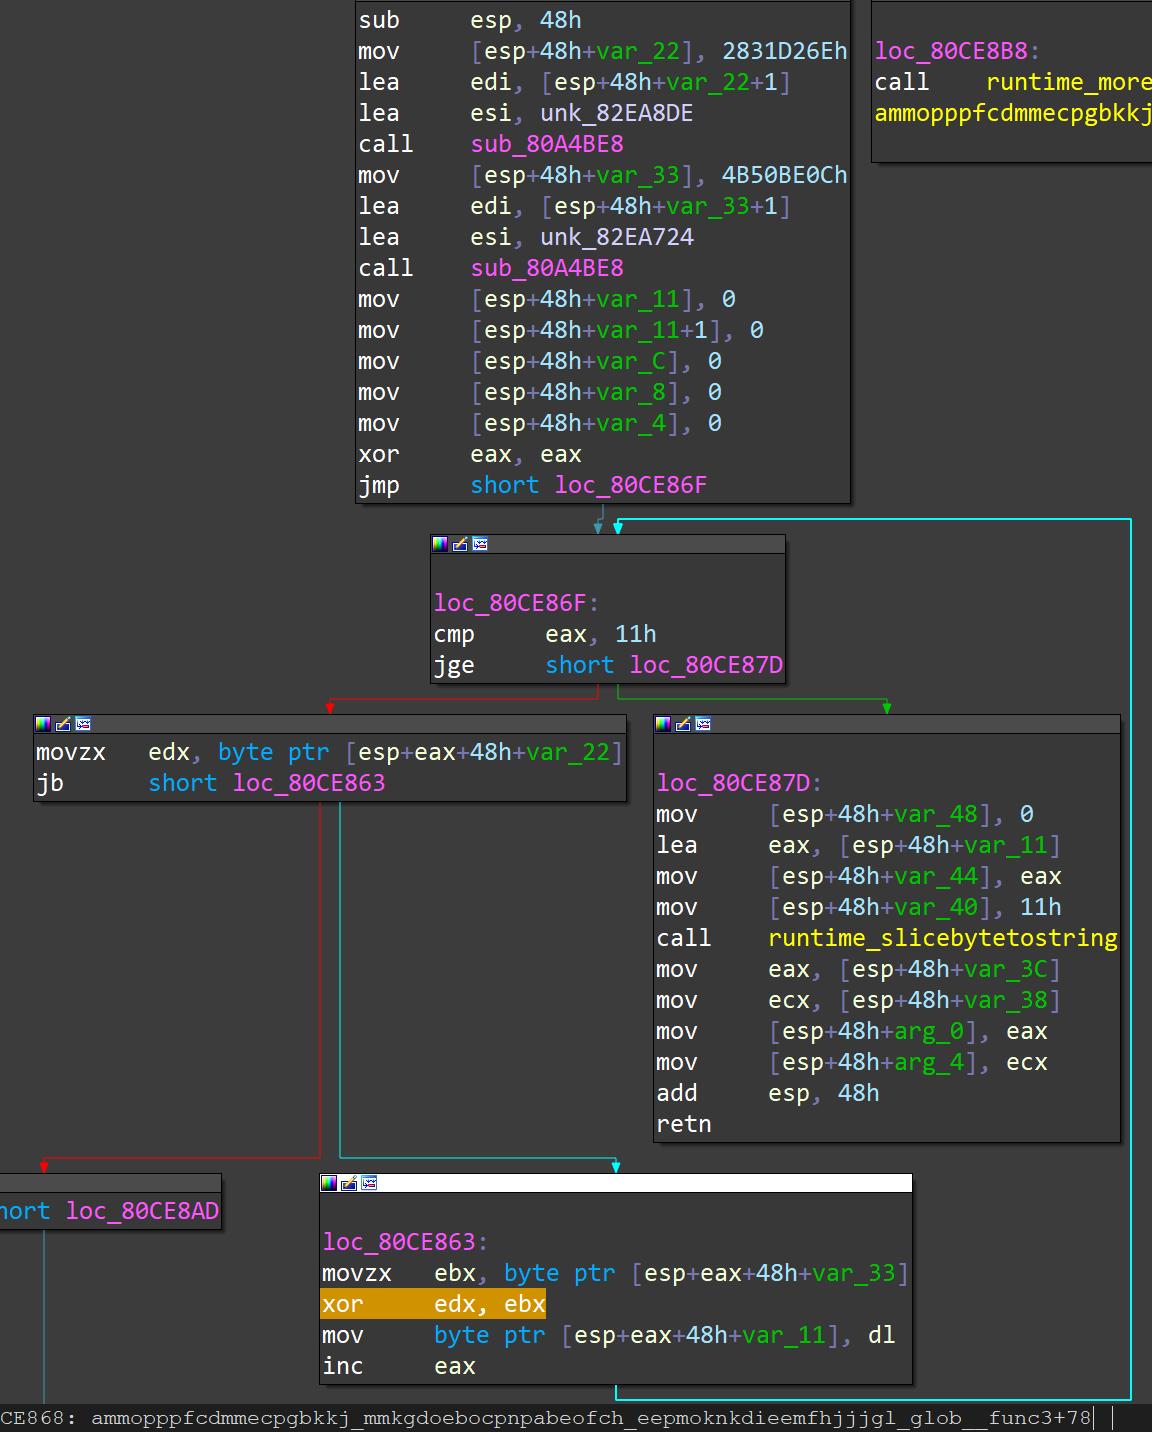 umair-akbar-xor func 1 - Blackrota, a heavily obfuscated backdoor written in Go